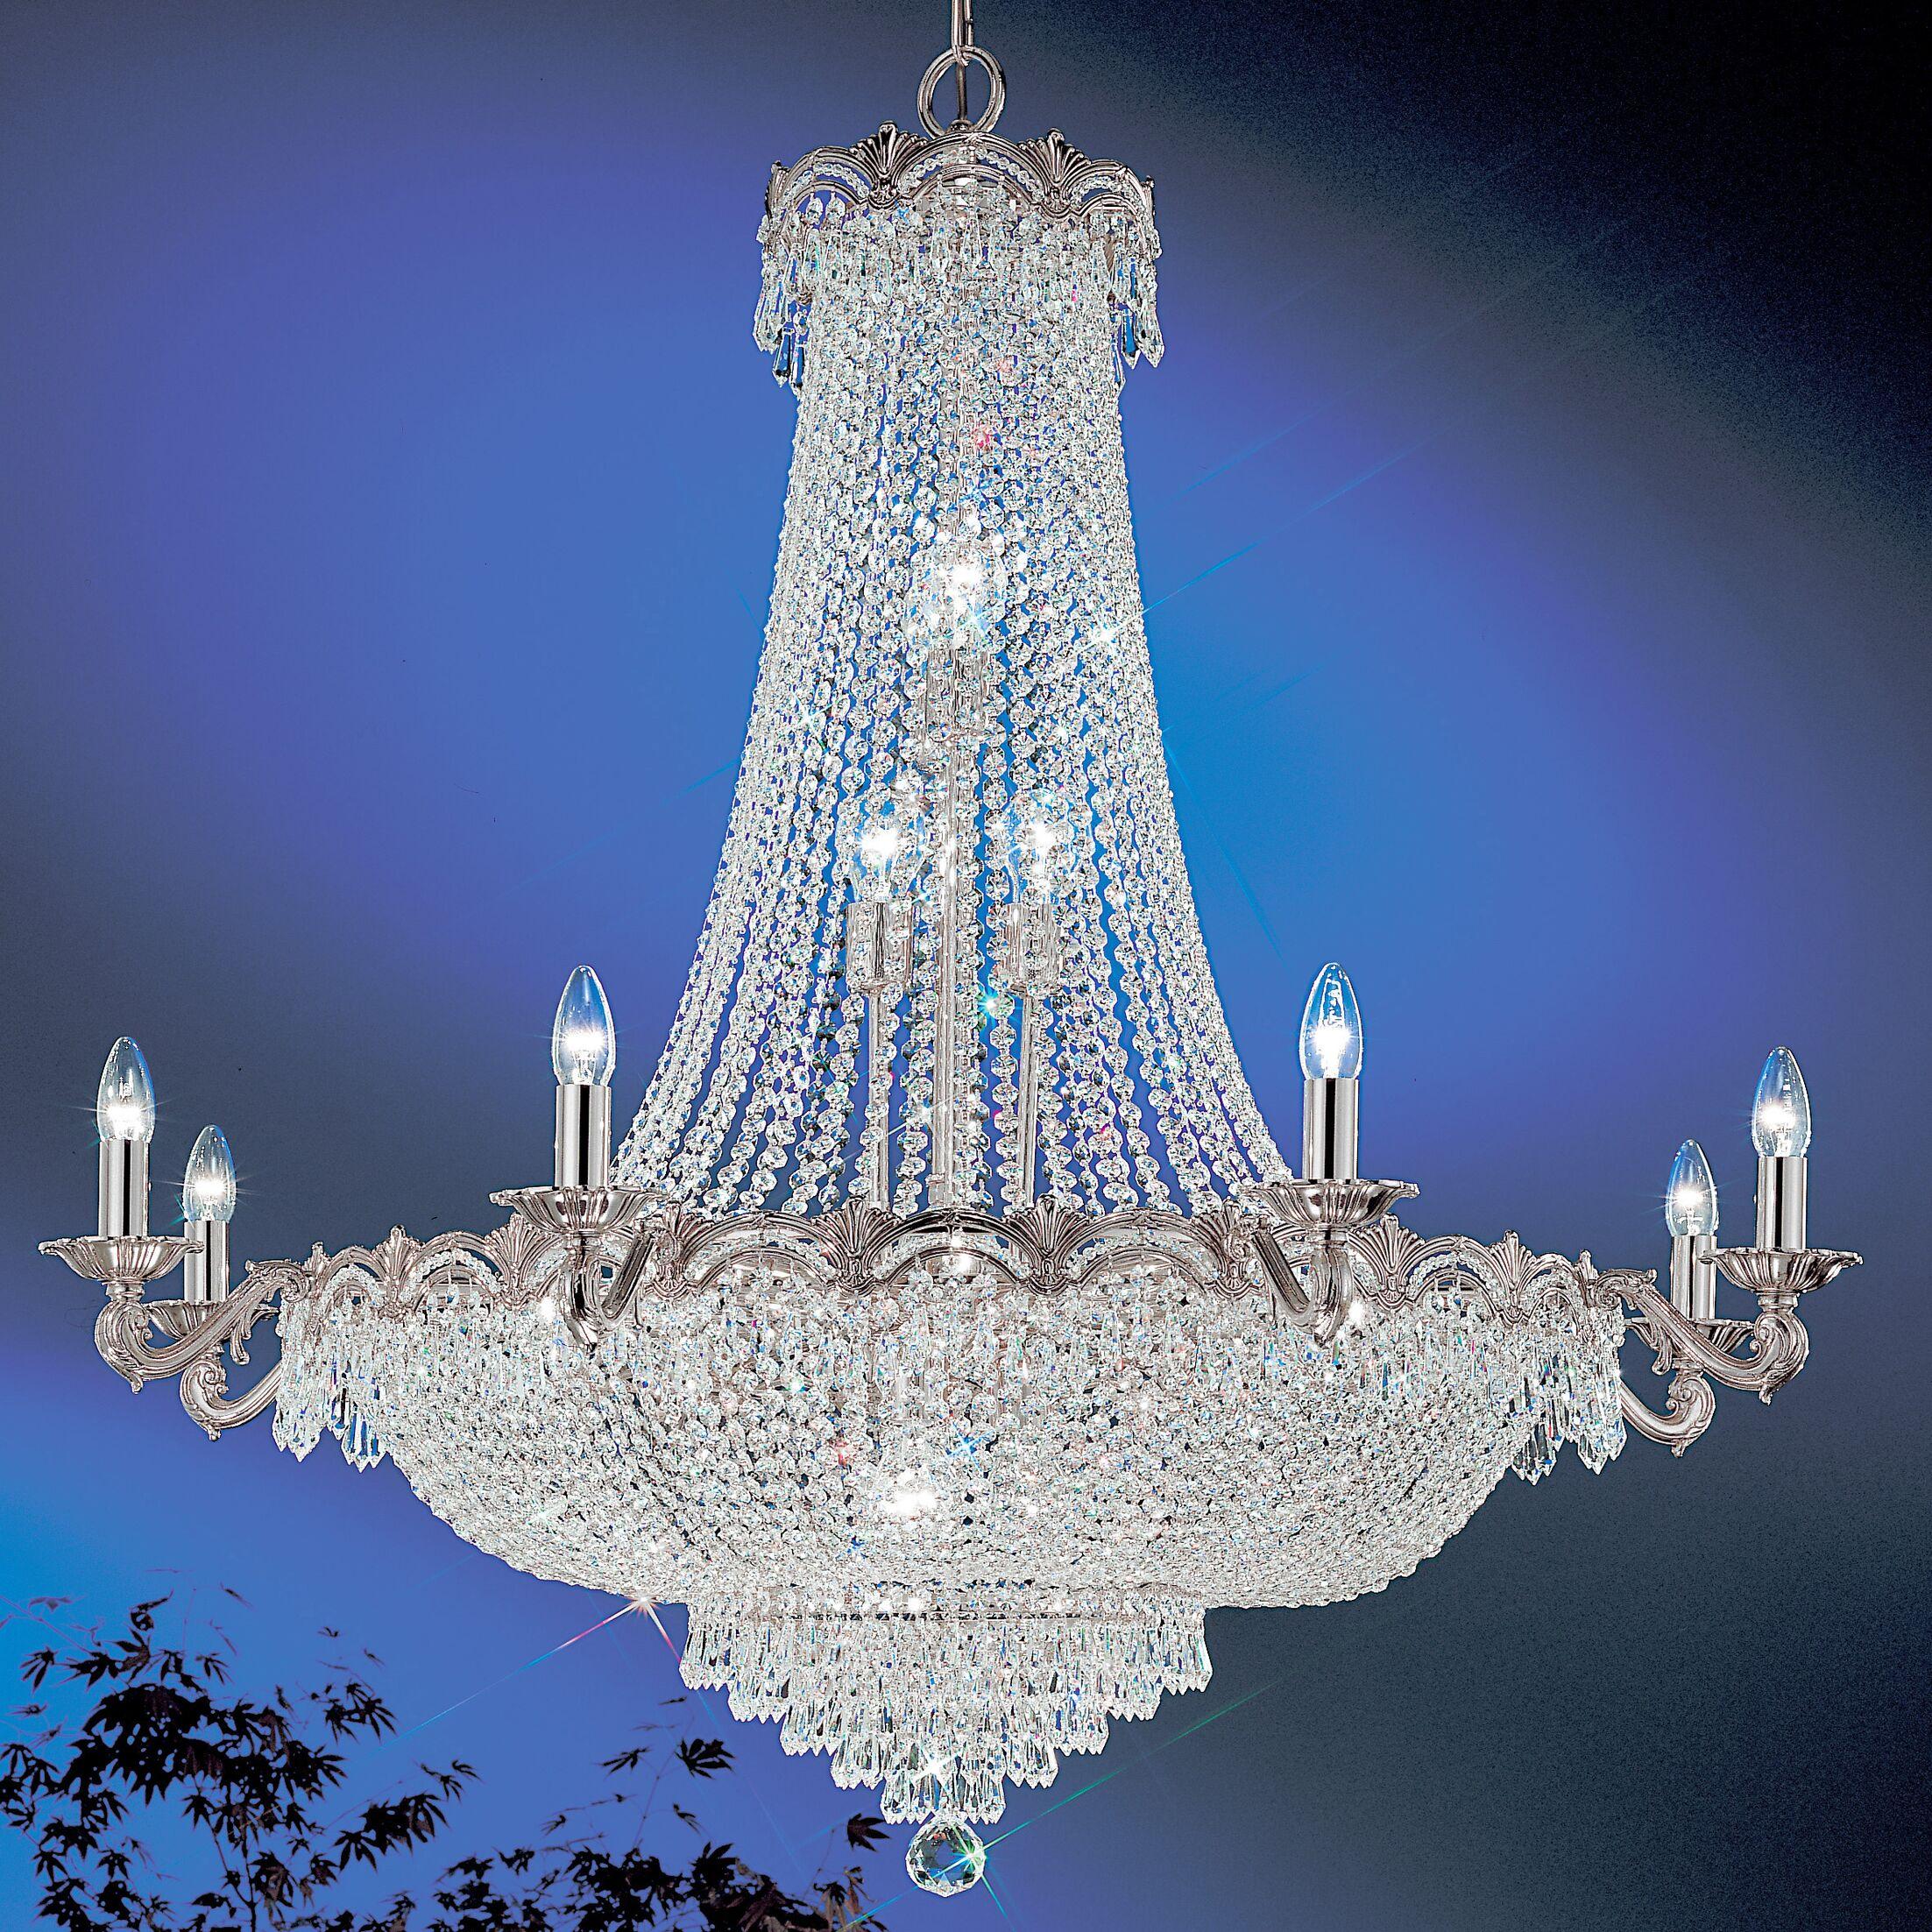 Regency II 20-Light Chandelier Crystal Type: Swarovski Spectra, Finish: 24k Gold Plate